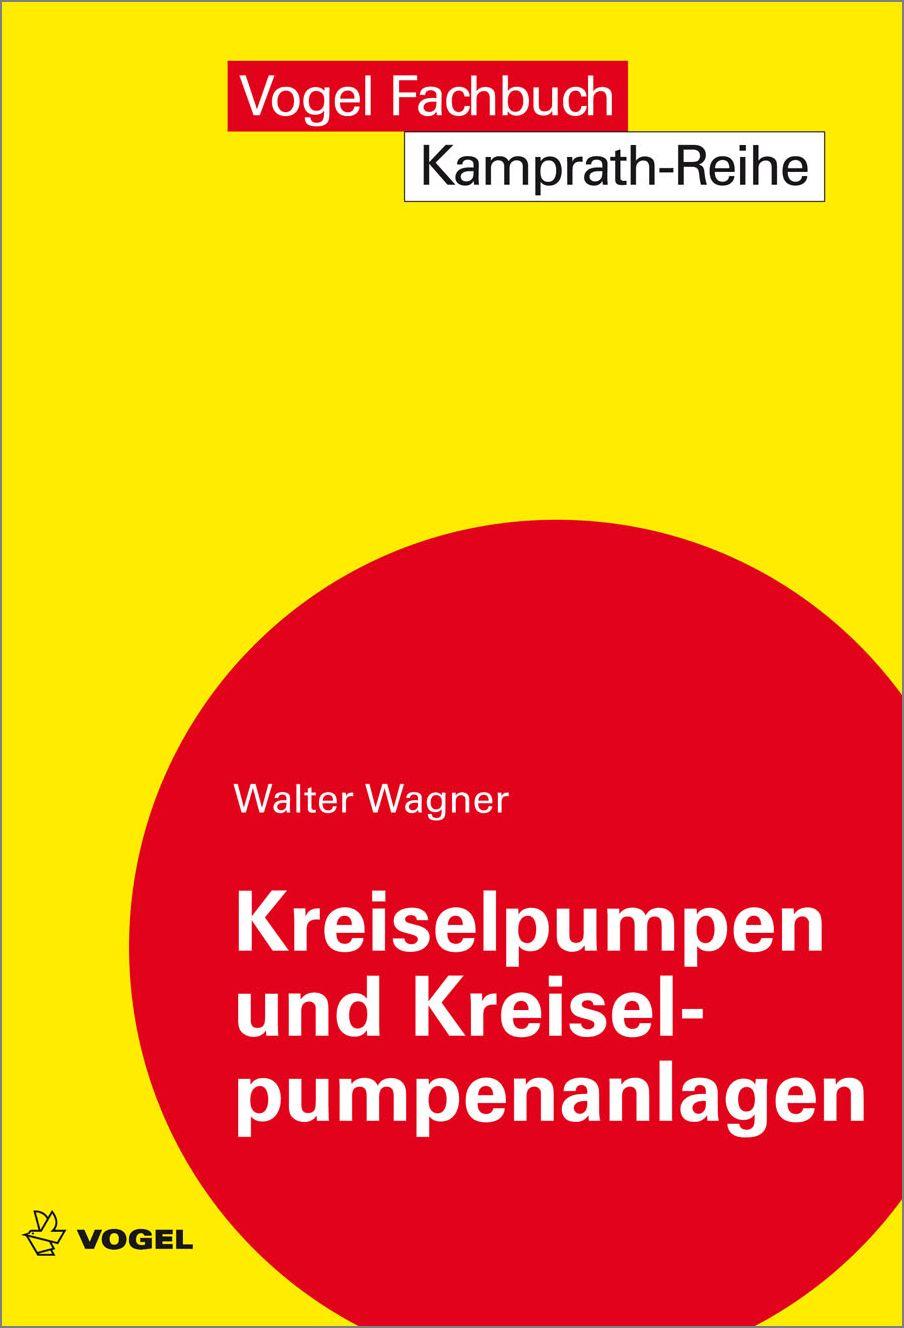 Titelbild Fachbuch Kreiselpumpen